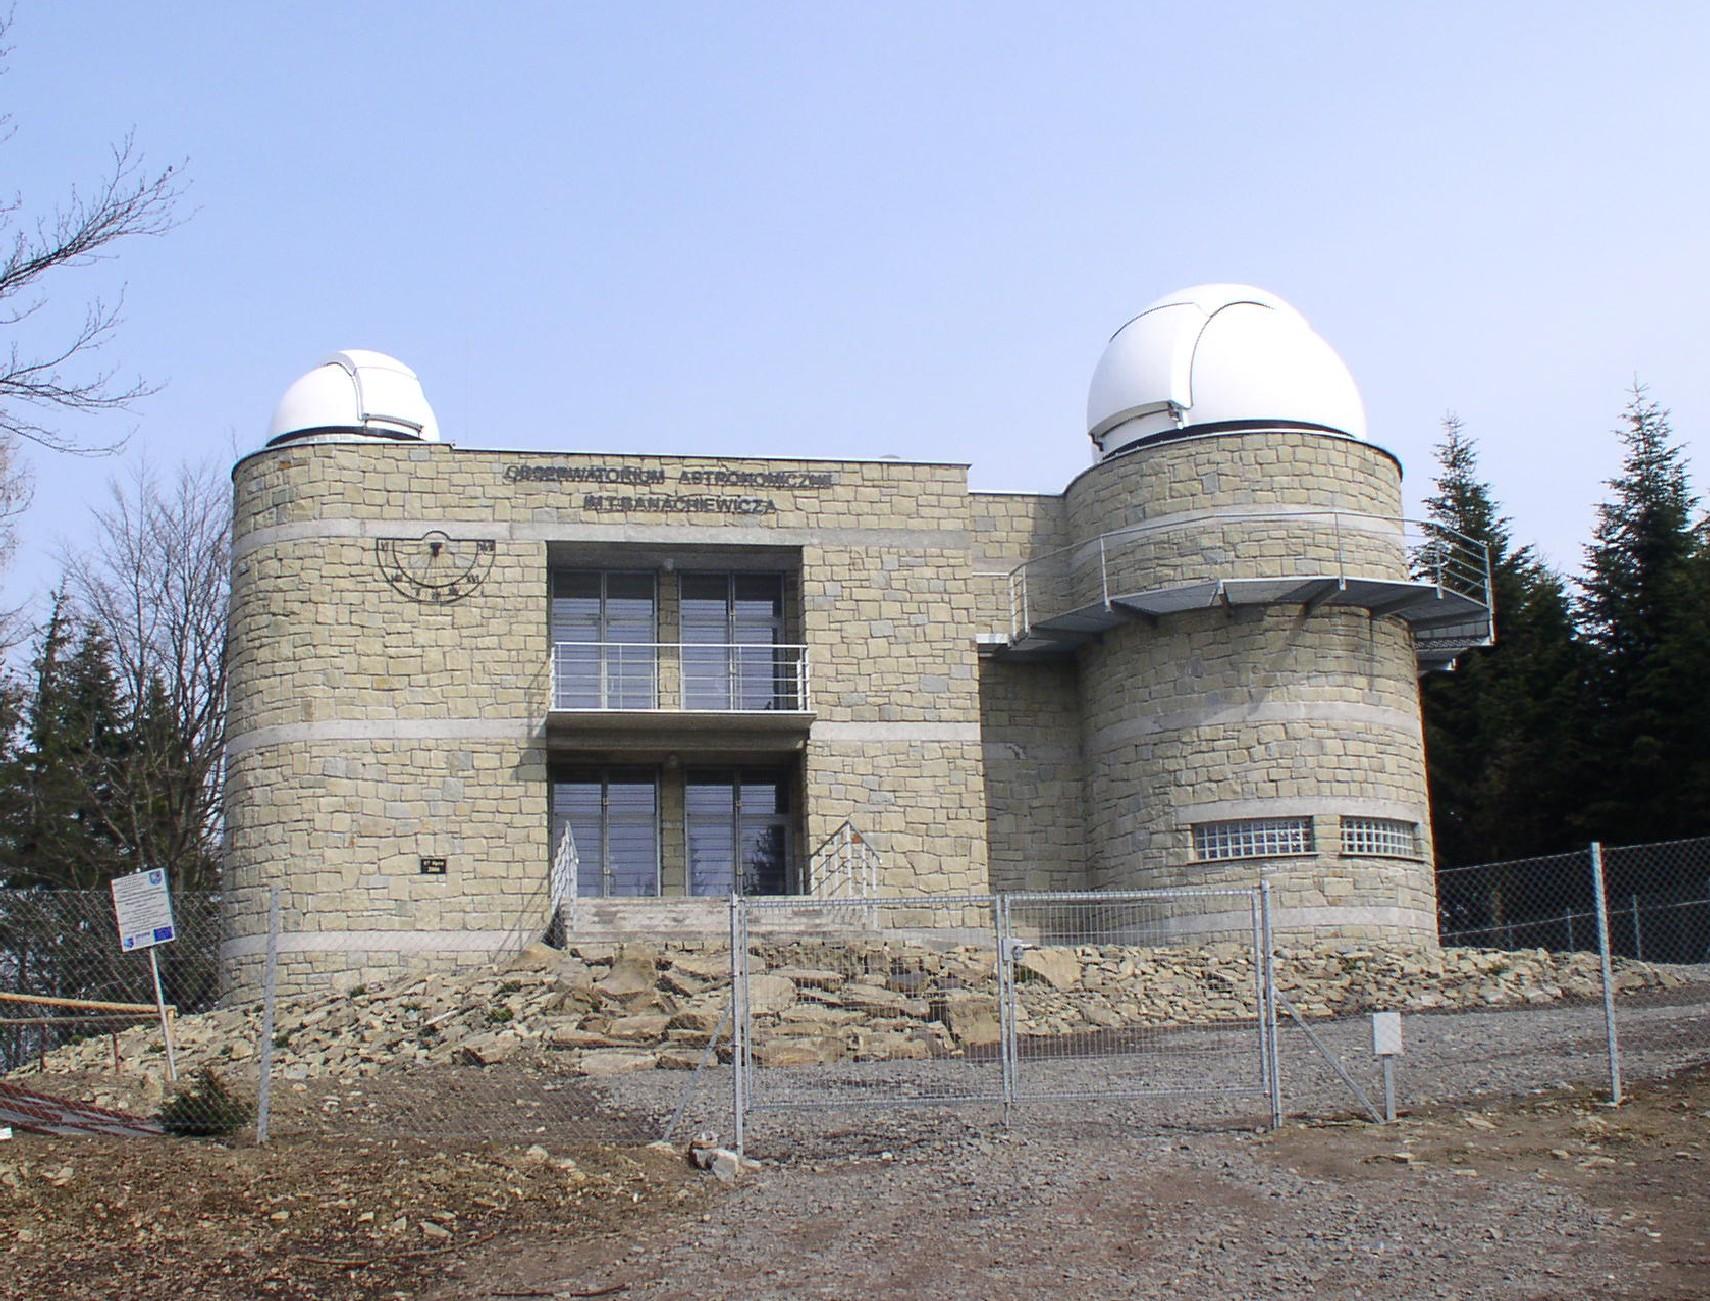 Lubomir obserwatorium astronomiczne